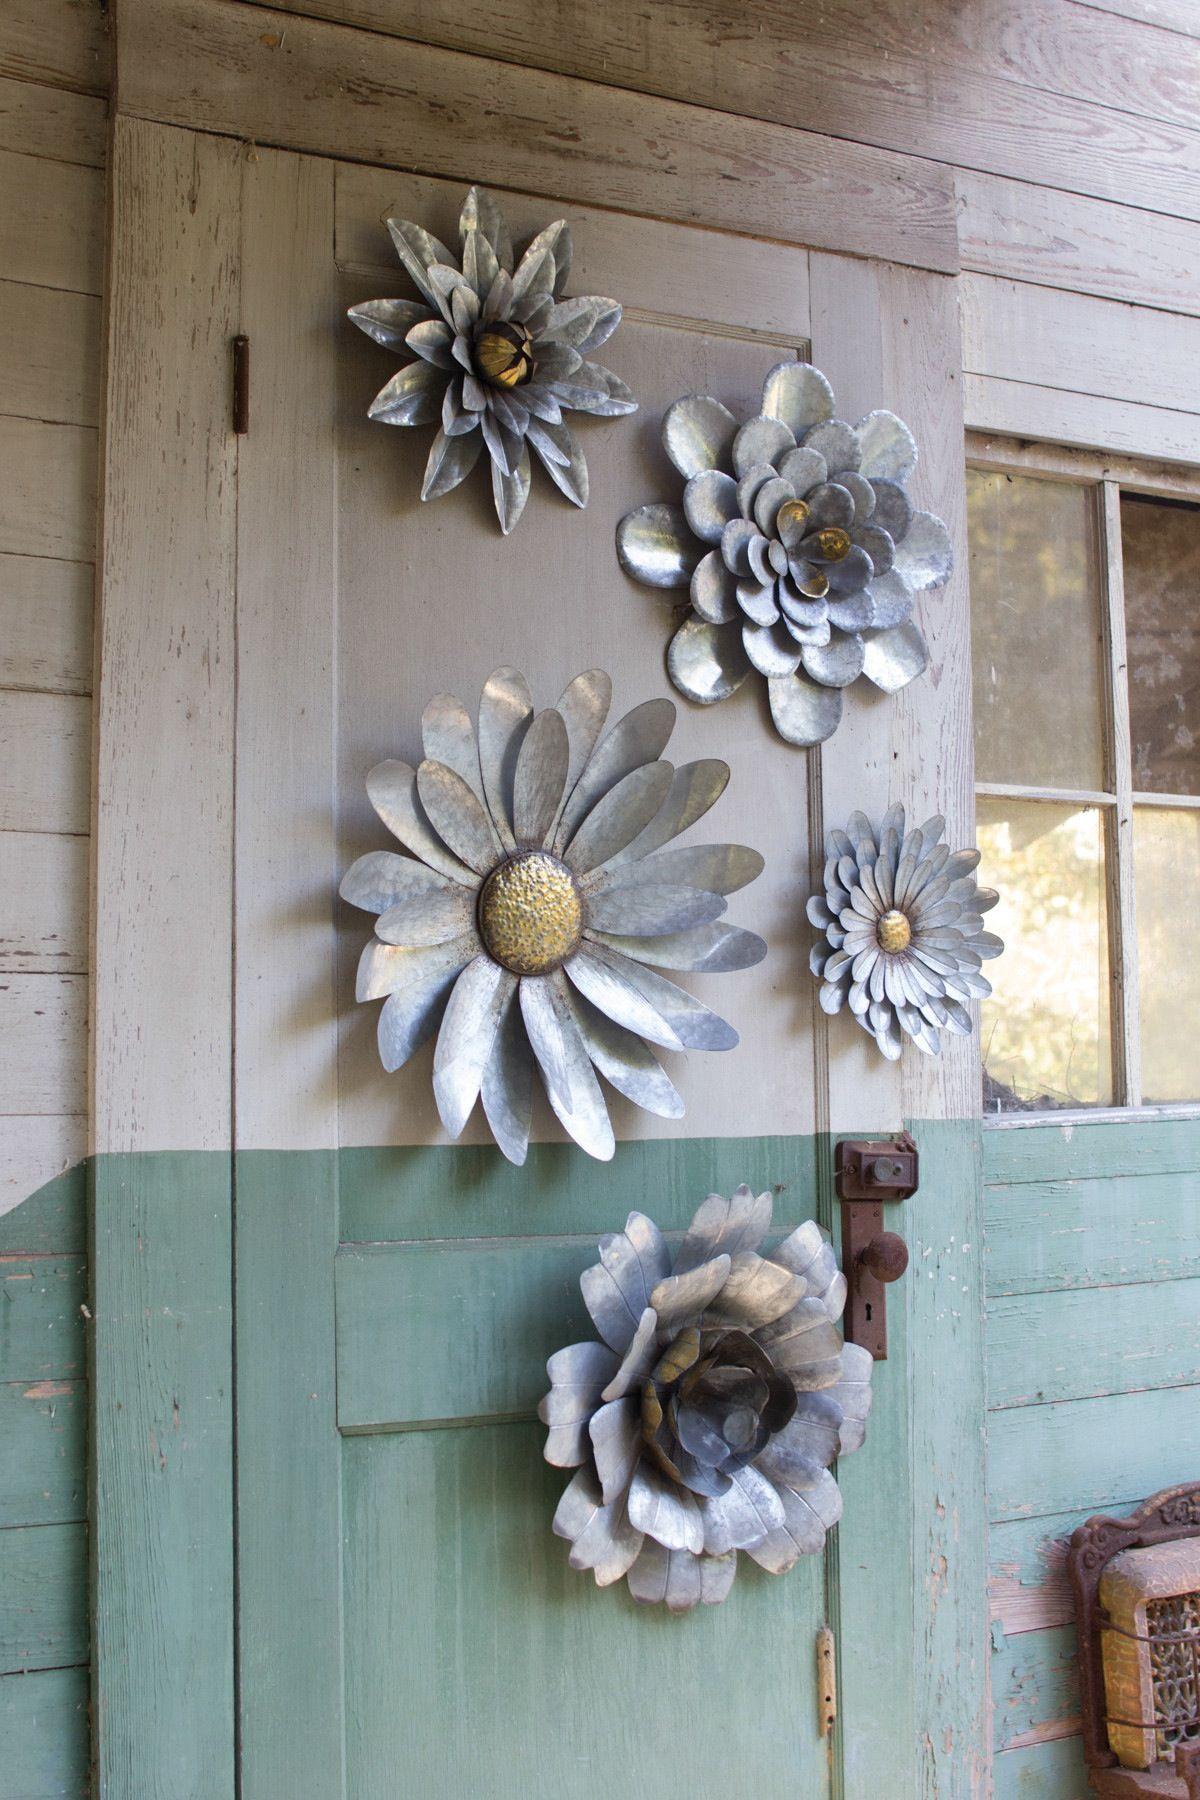 Kalalou Galvanized Metal Flower Wall Hangings Set Of 5 In 2021 Metal Flowers Scrap Metal Art Metal Garden Art